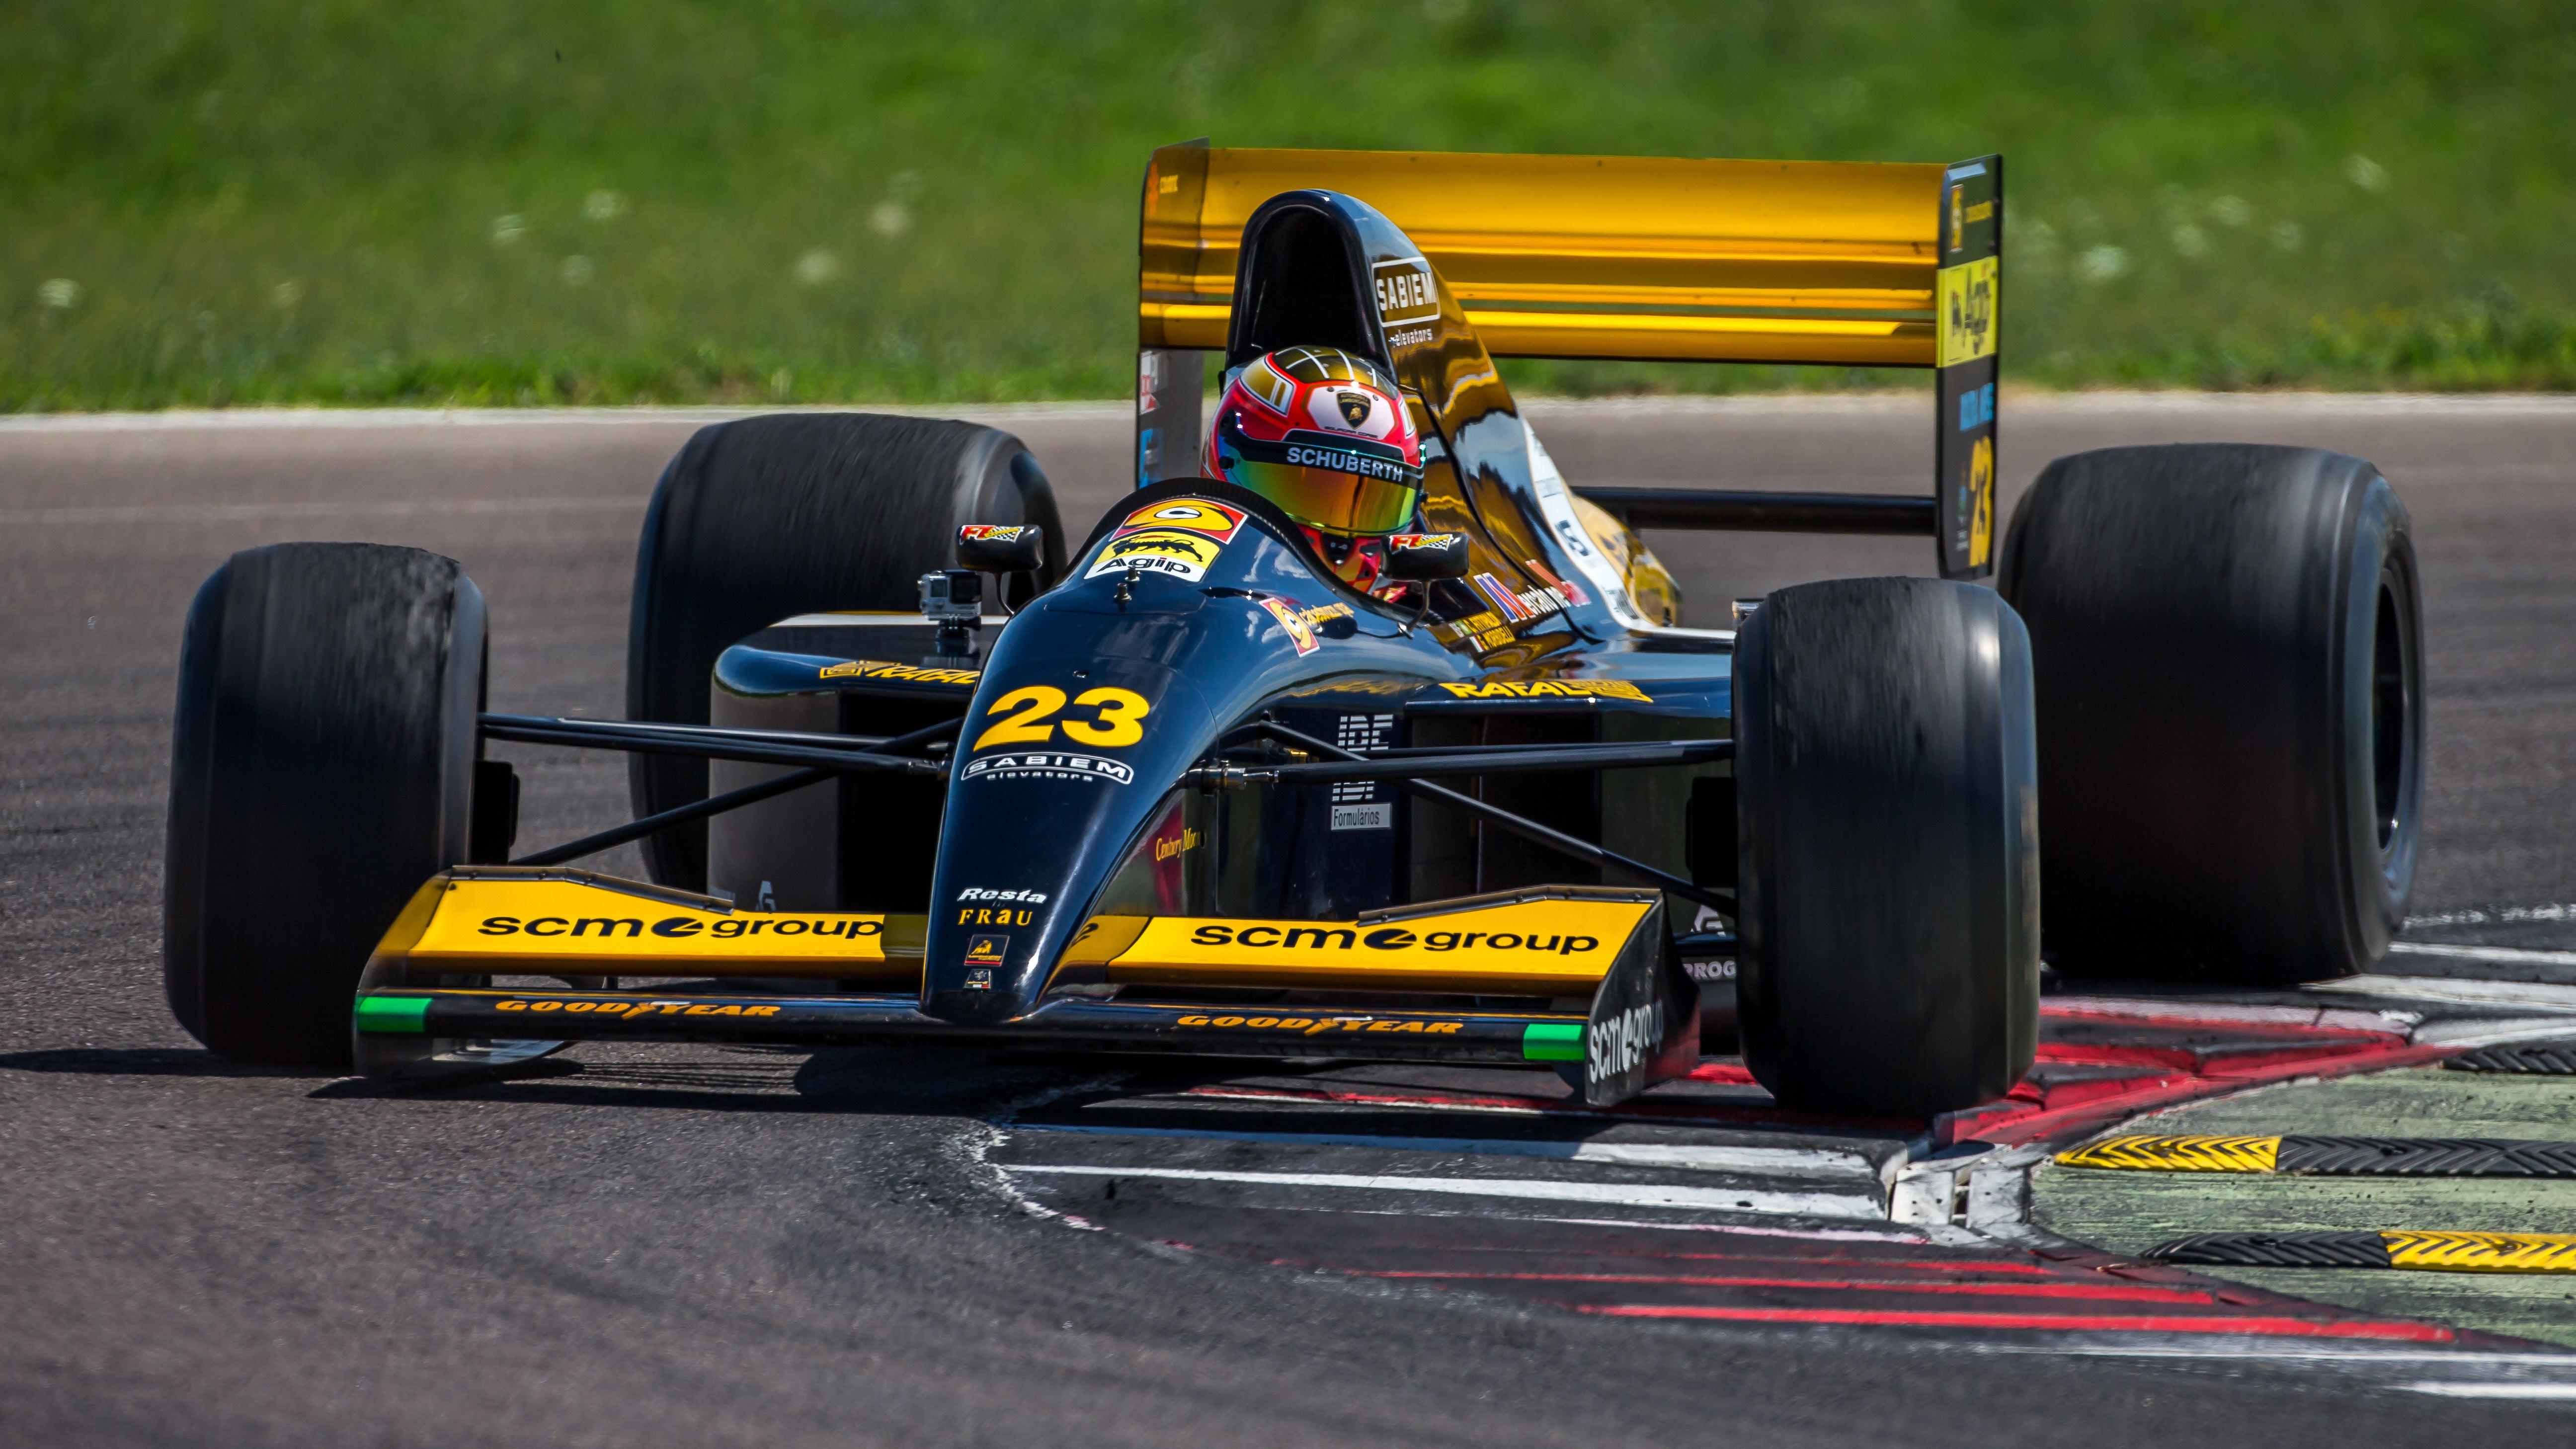 formula-one jalopnik lamborghini minardi racing vintage-racing